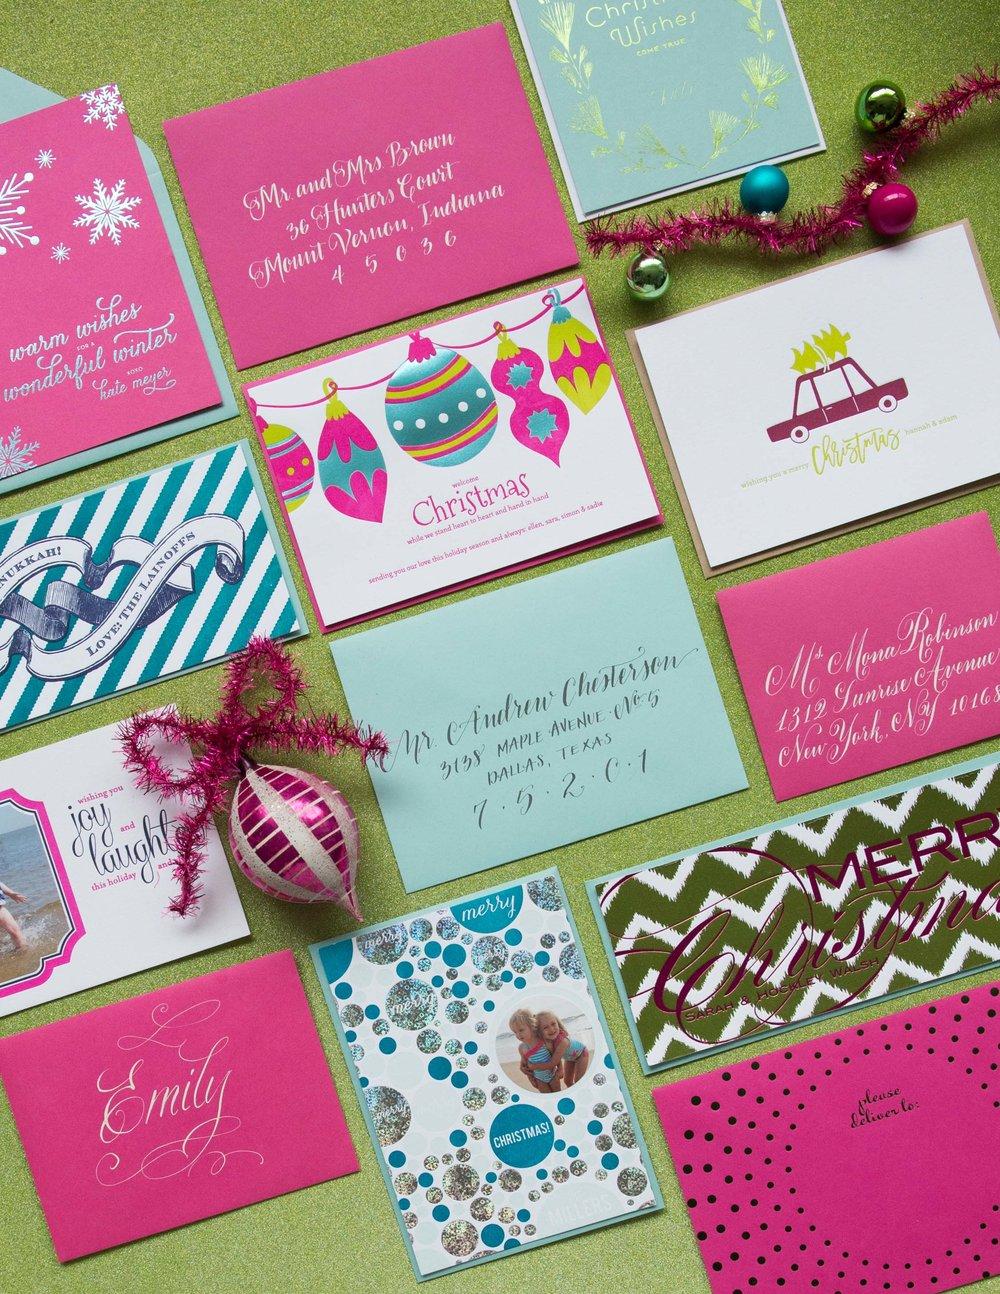 Holiday_Assorted_Pink_HautePapier_Pink_Insta.jpg